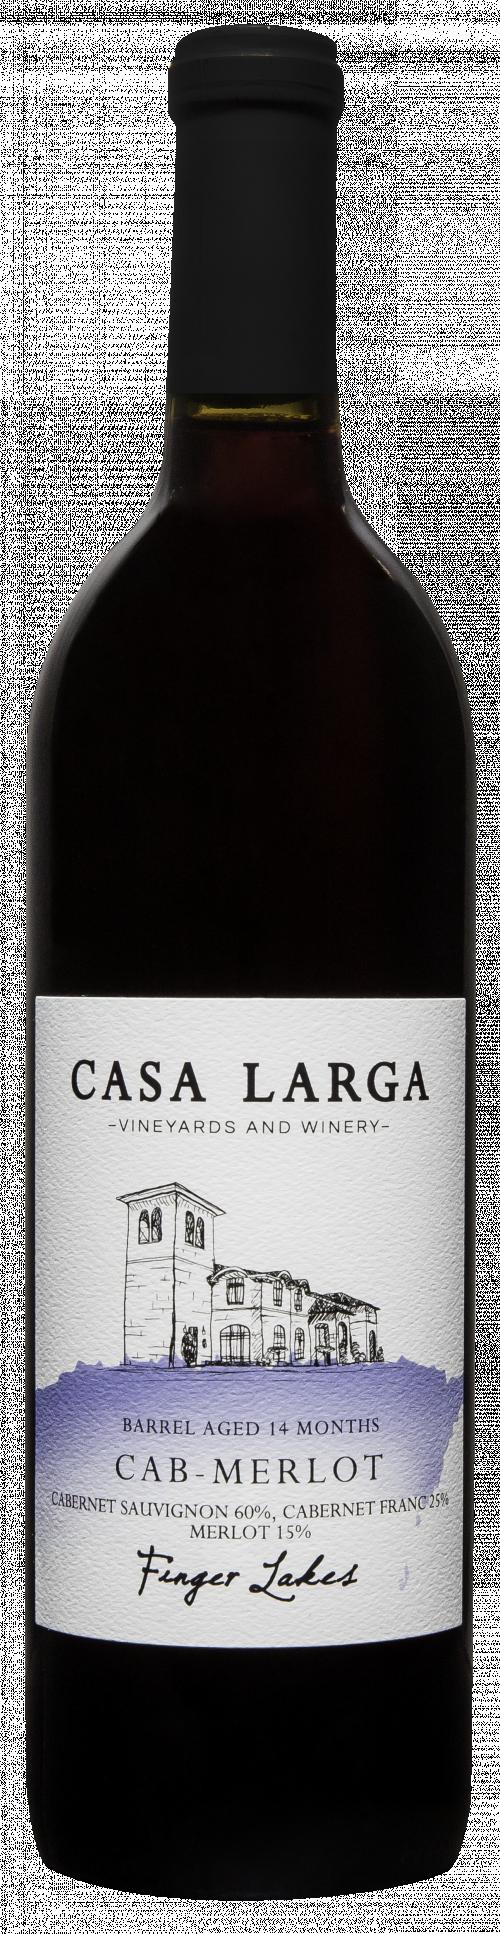 Casa Larga Cabernet/Merlot 750ml NV